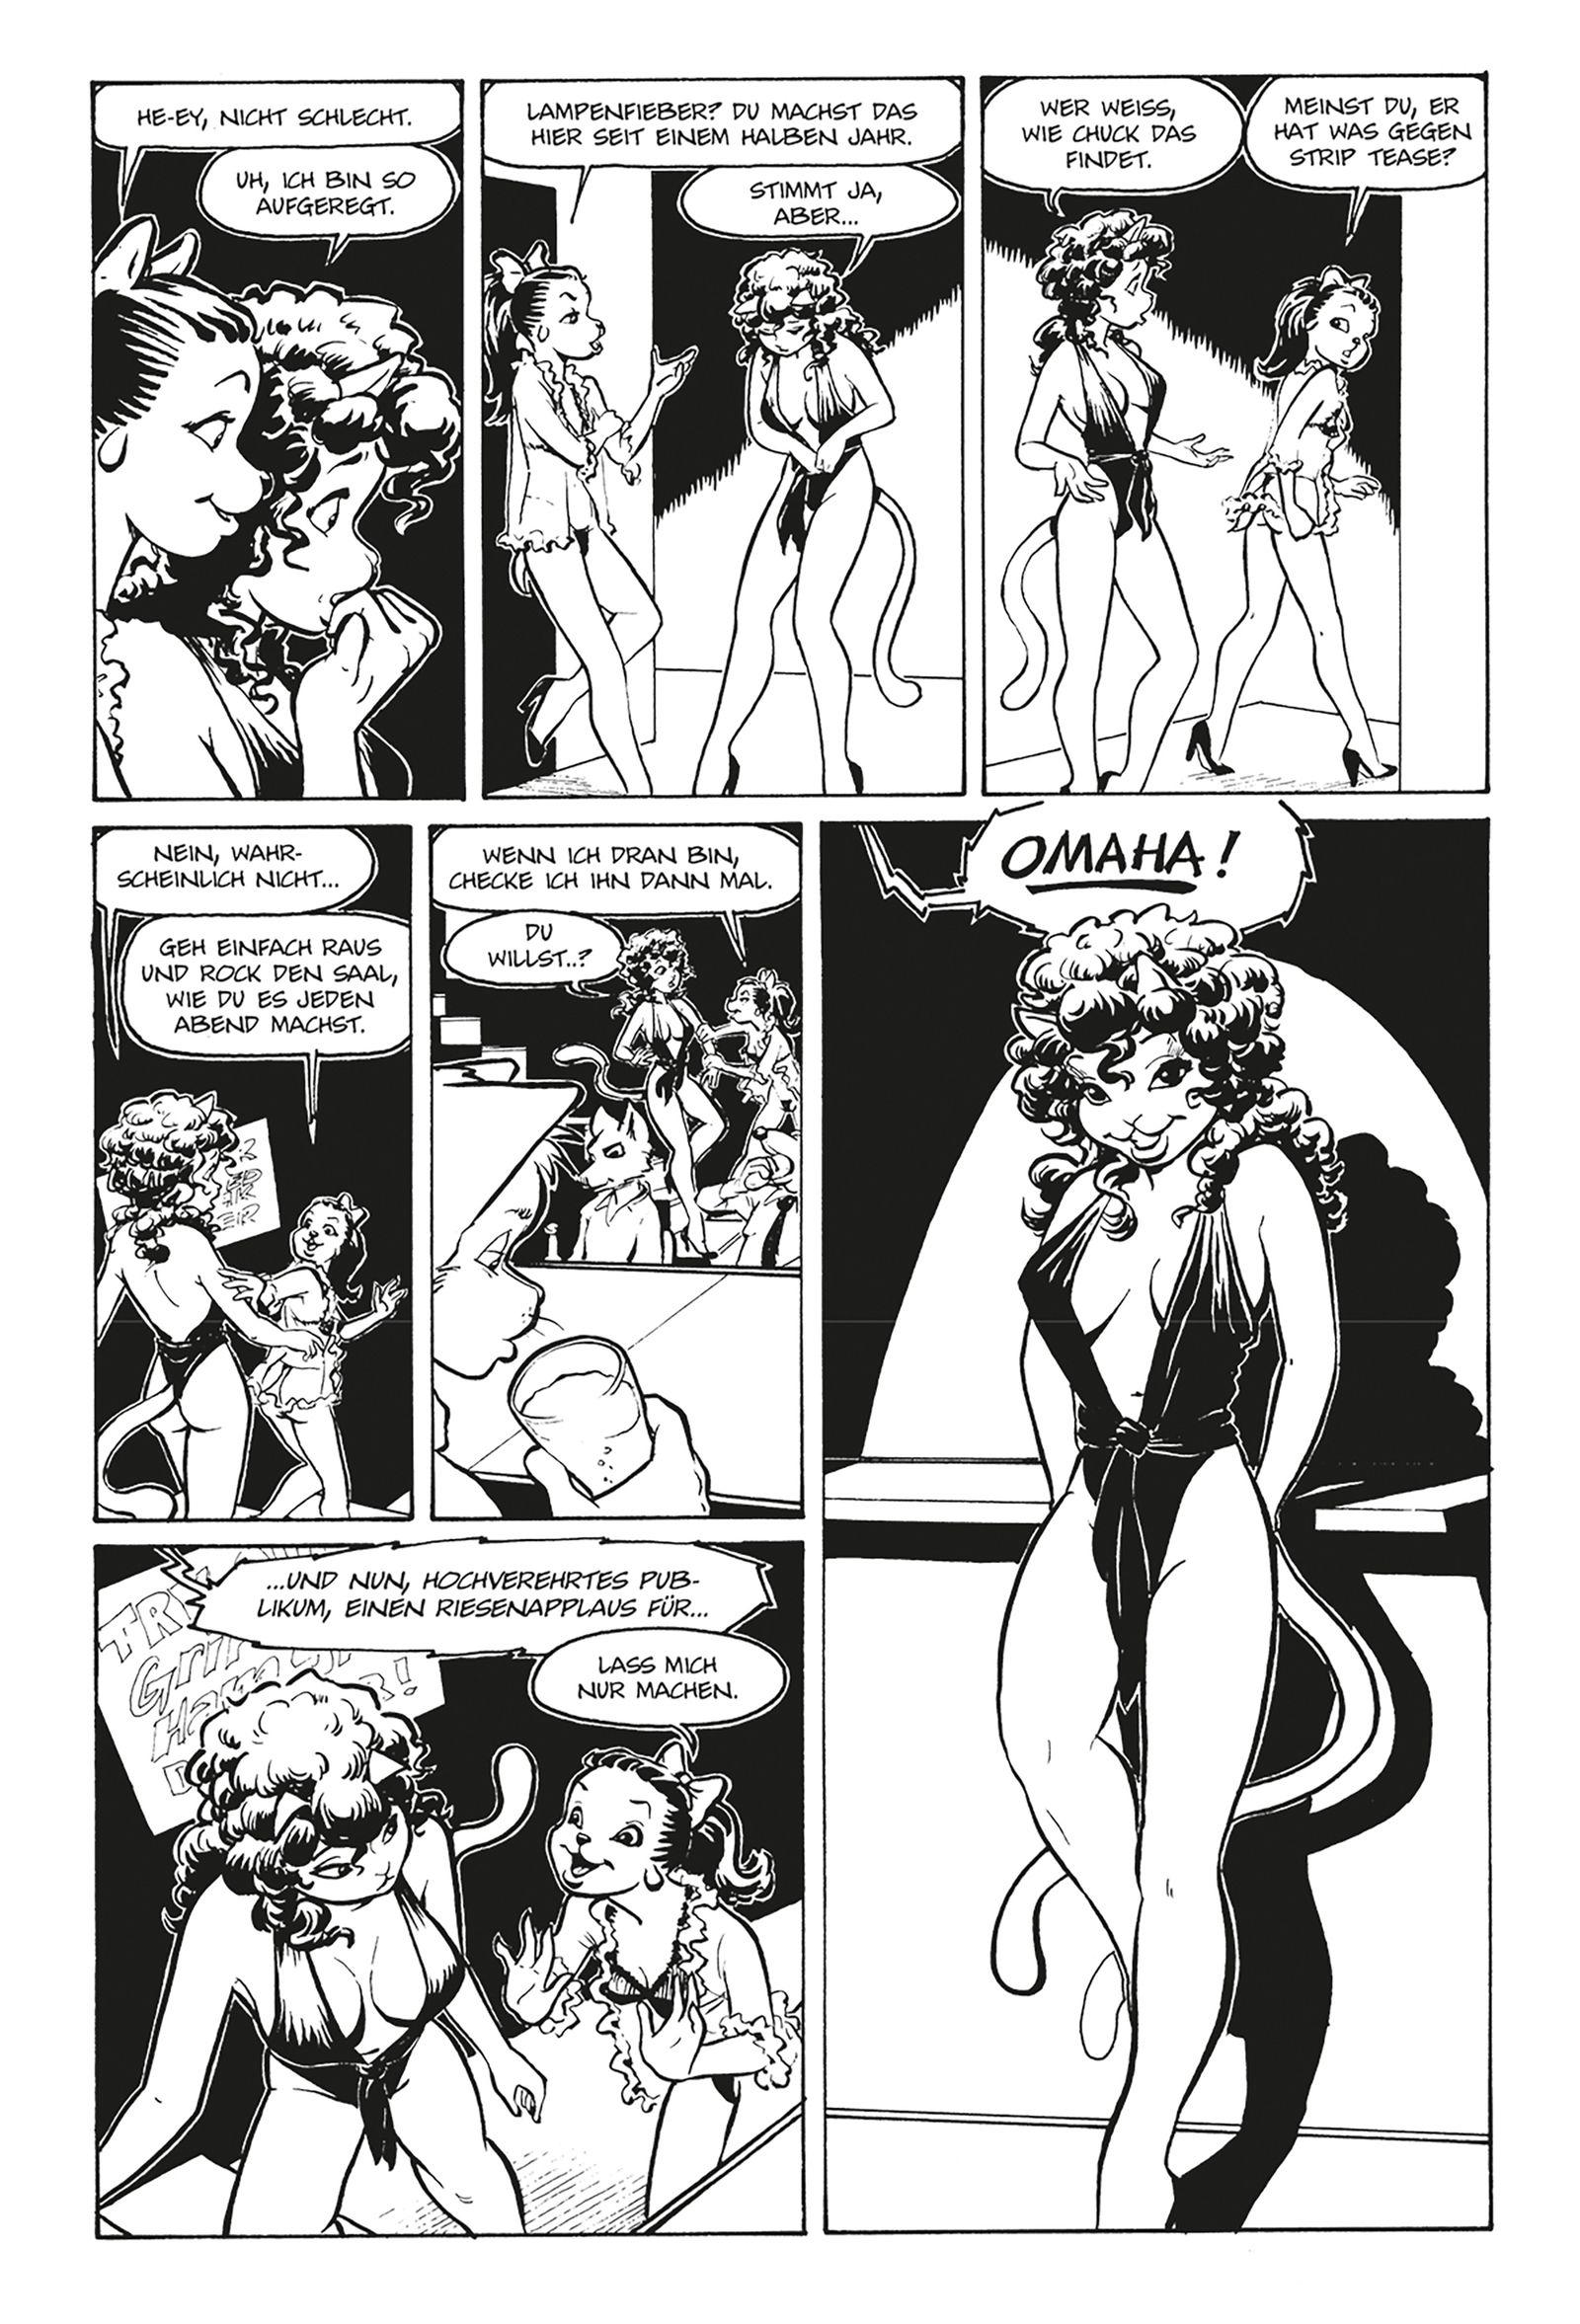 Comic/ Reed Waller & Kate Worley: Omaha